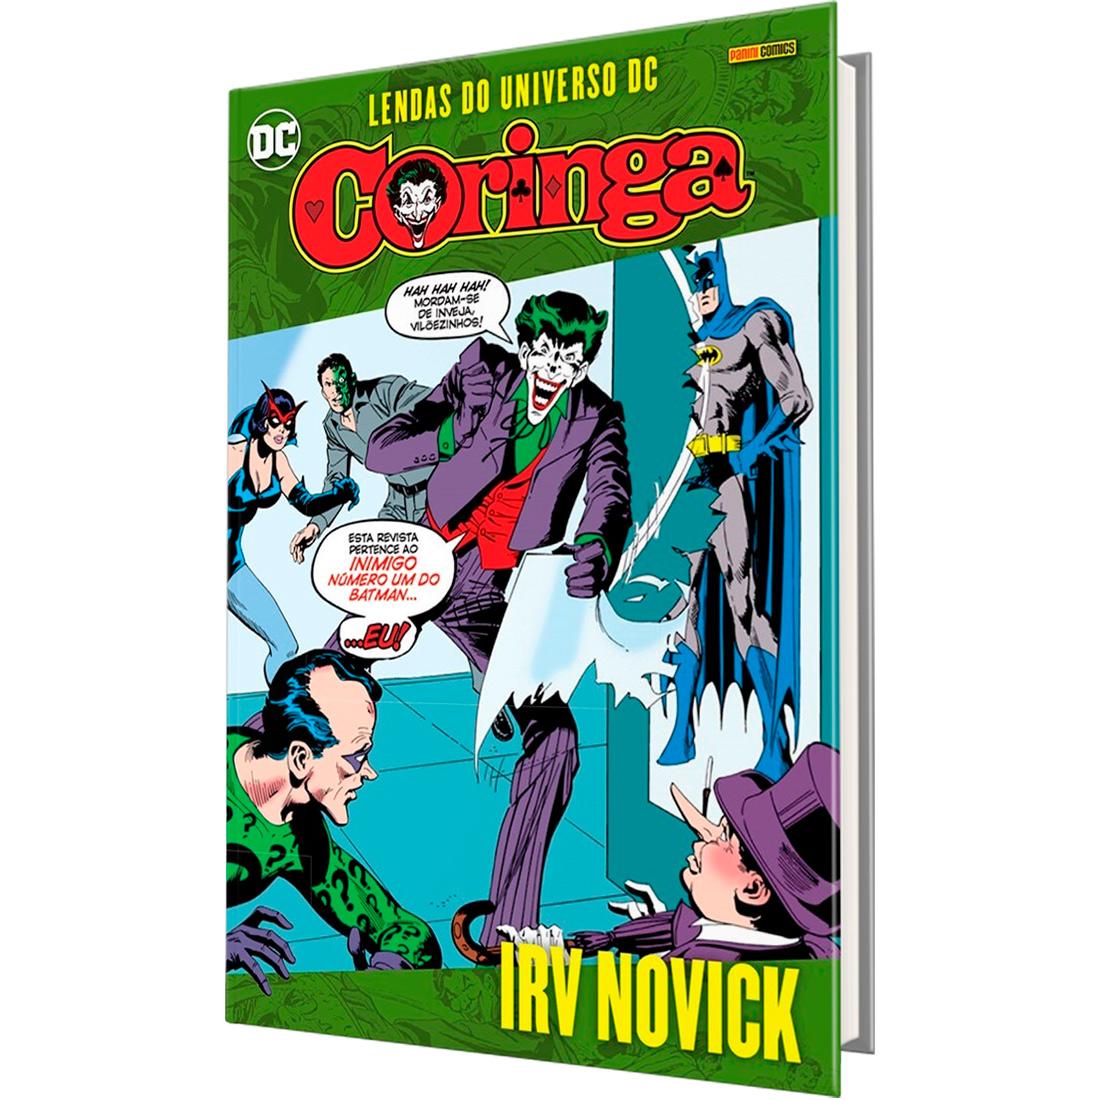 Lendas do Universo DC - Coringa